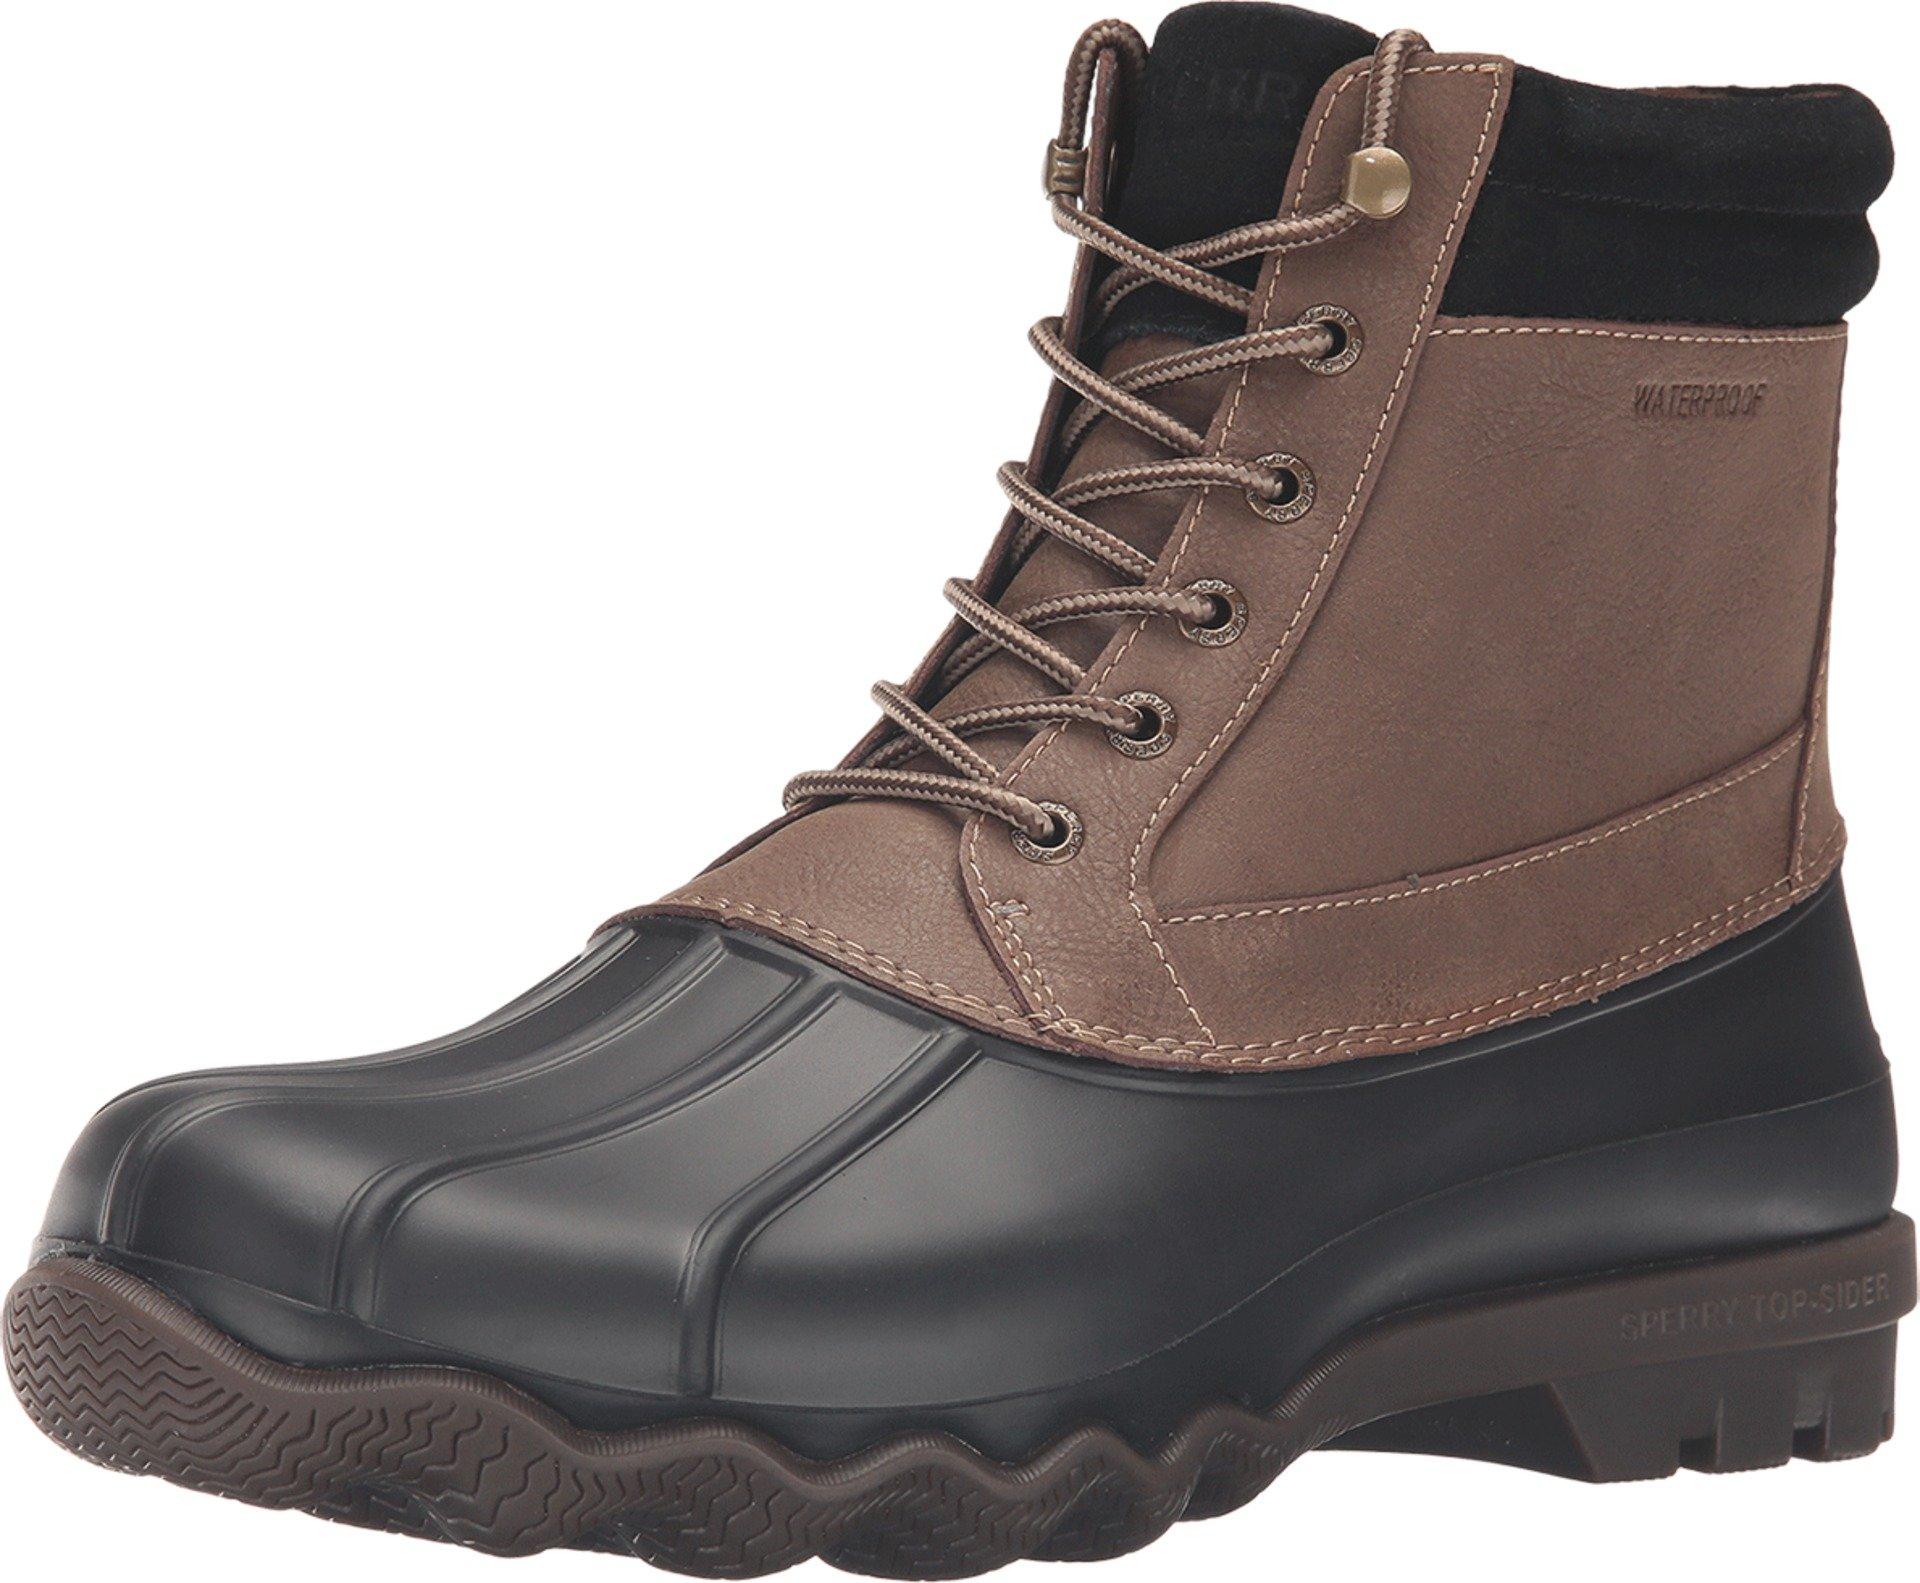 Sperry Top-Sider Men's Brewster Brown Boot 12 M